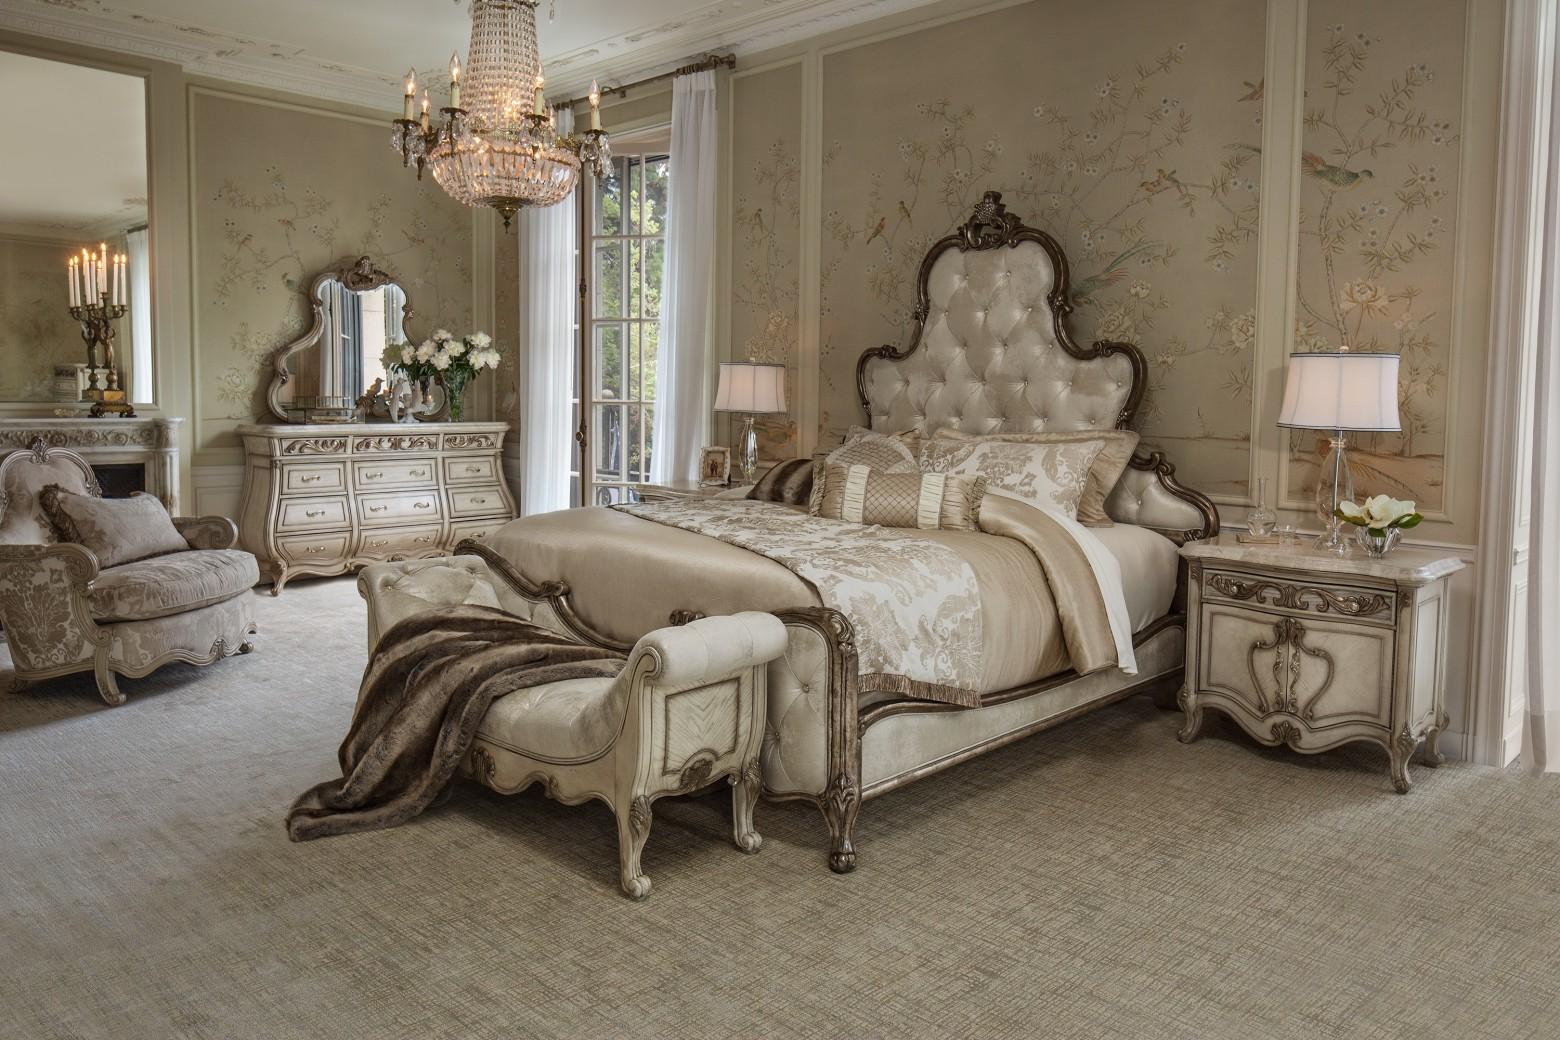 Attirant AICO Platine De Royale Bedroom Set Collection Antique Platimun Finish